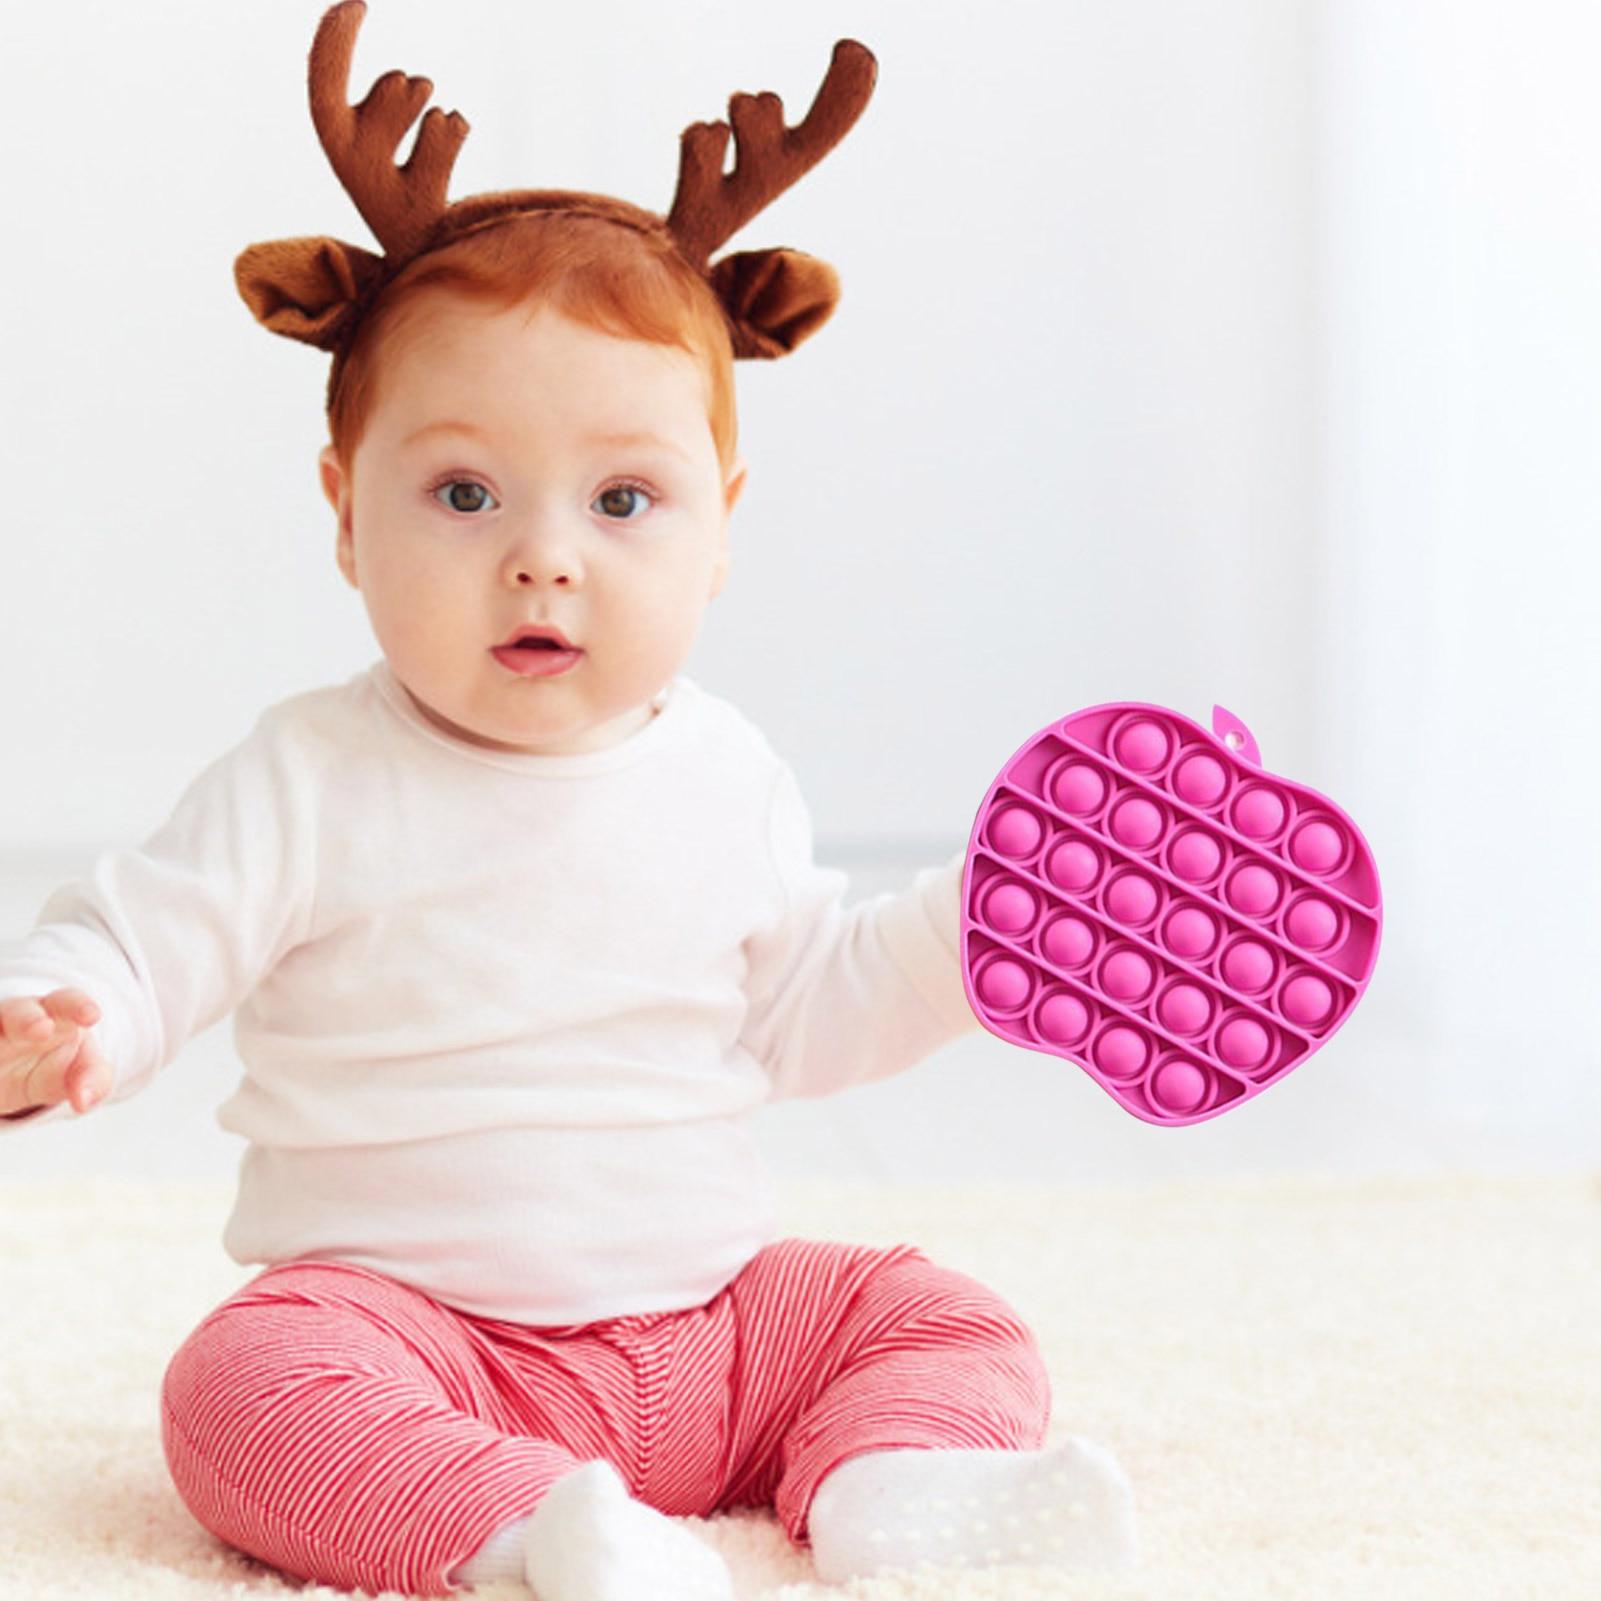 Adult Toys Fidget Rainbow Bubble-Sensory Squishy Pop-It Push-Pops Needs Anti-Stress Children img4